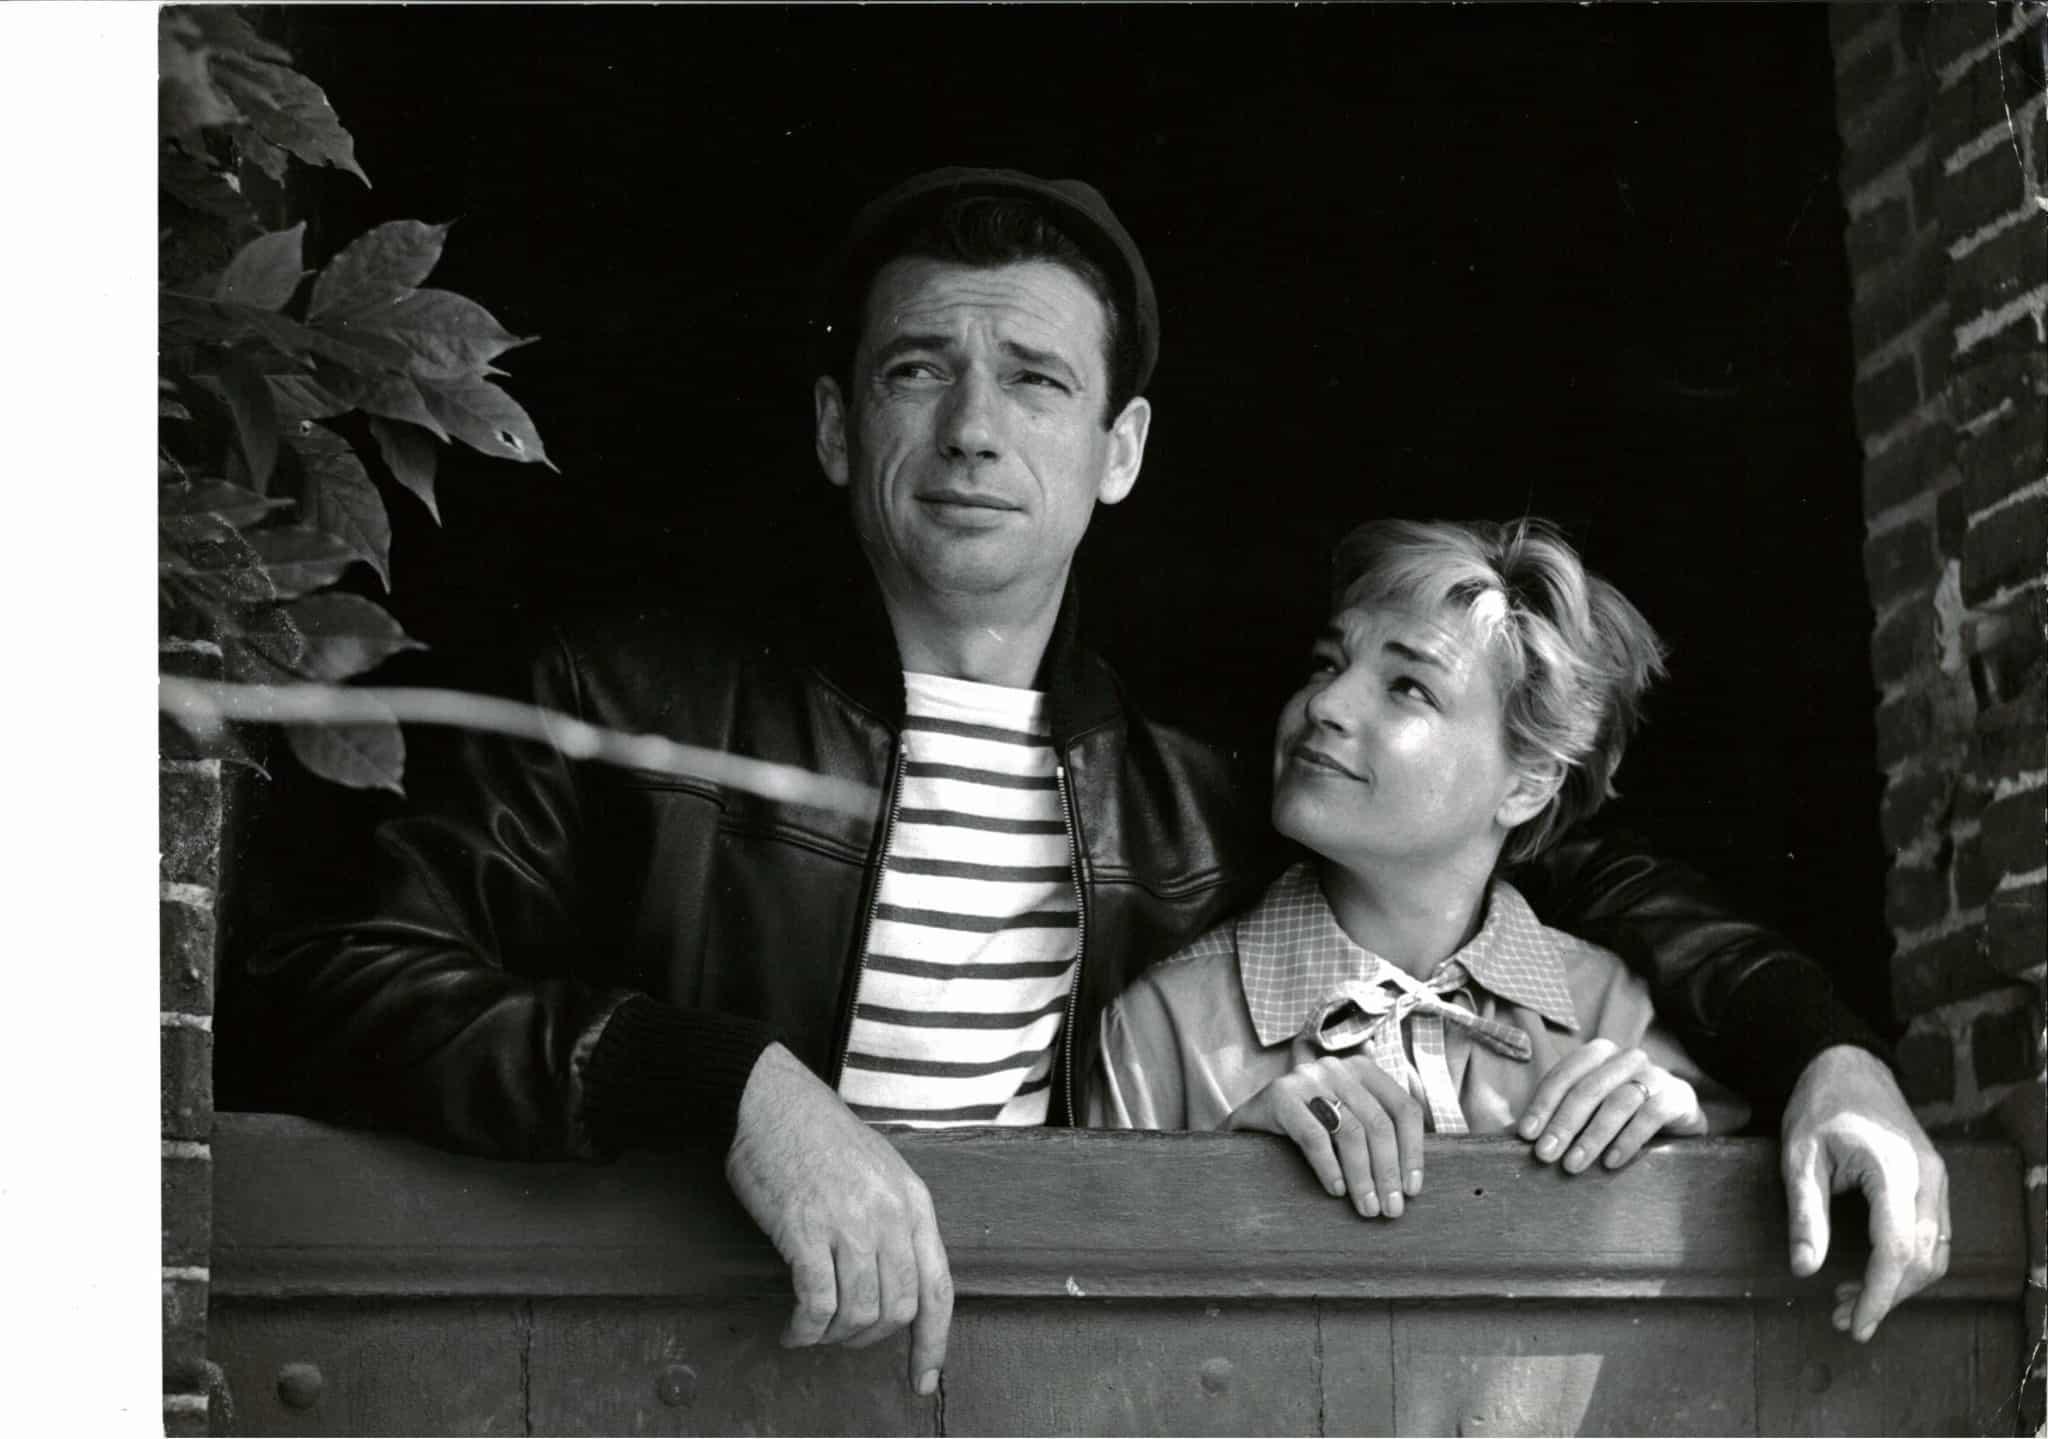 Simone Signoret Yves Montand enchères Autheuil photo auctionlab